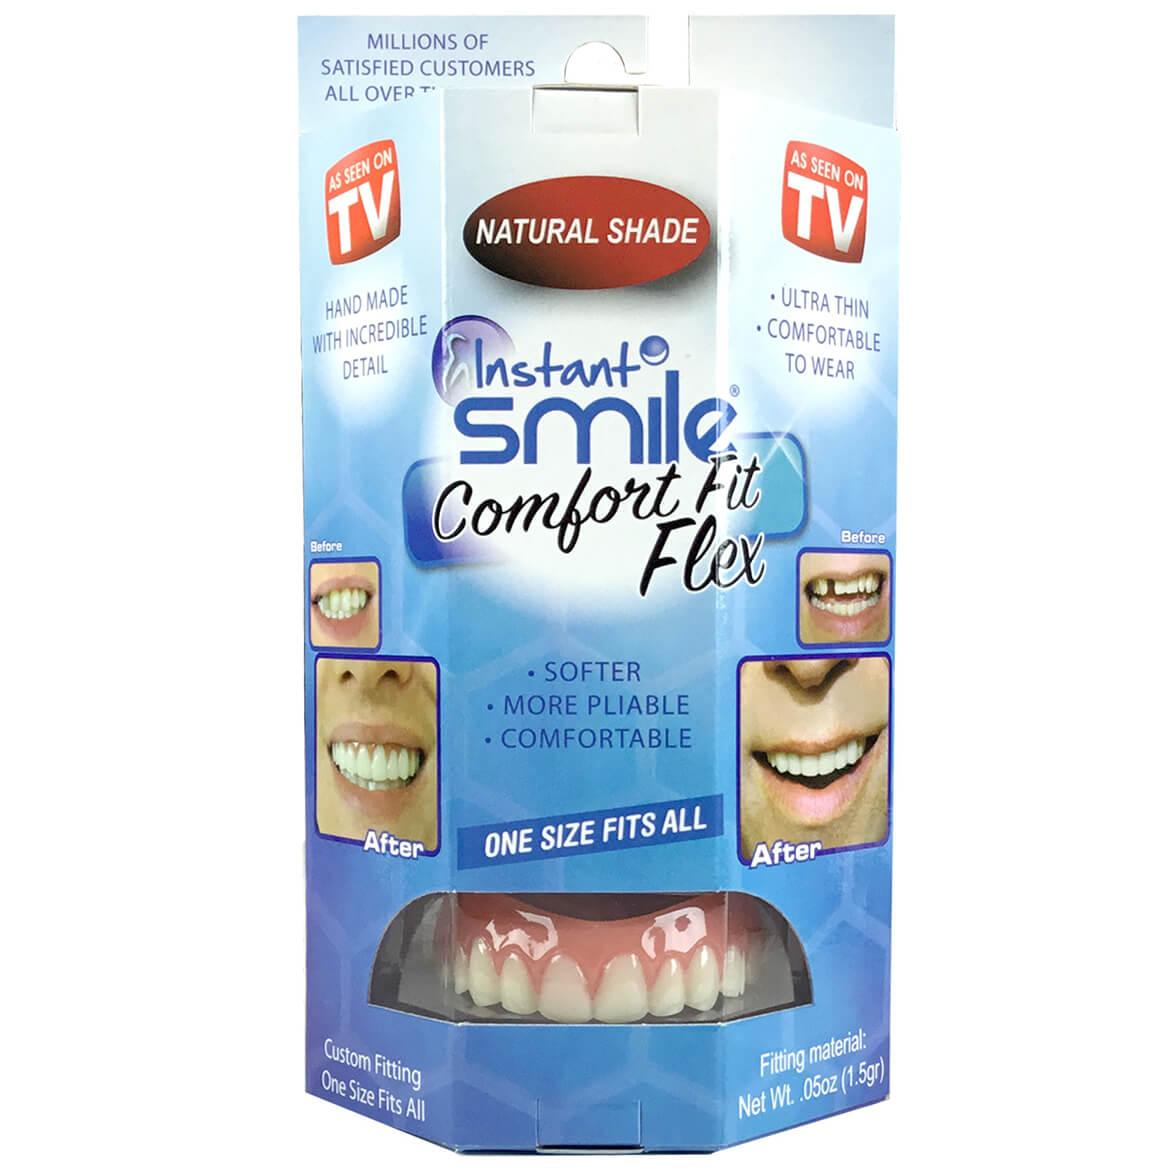 Instant Smile™ Comfort Fit Flex Upper Veneer Natural White-371252